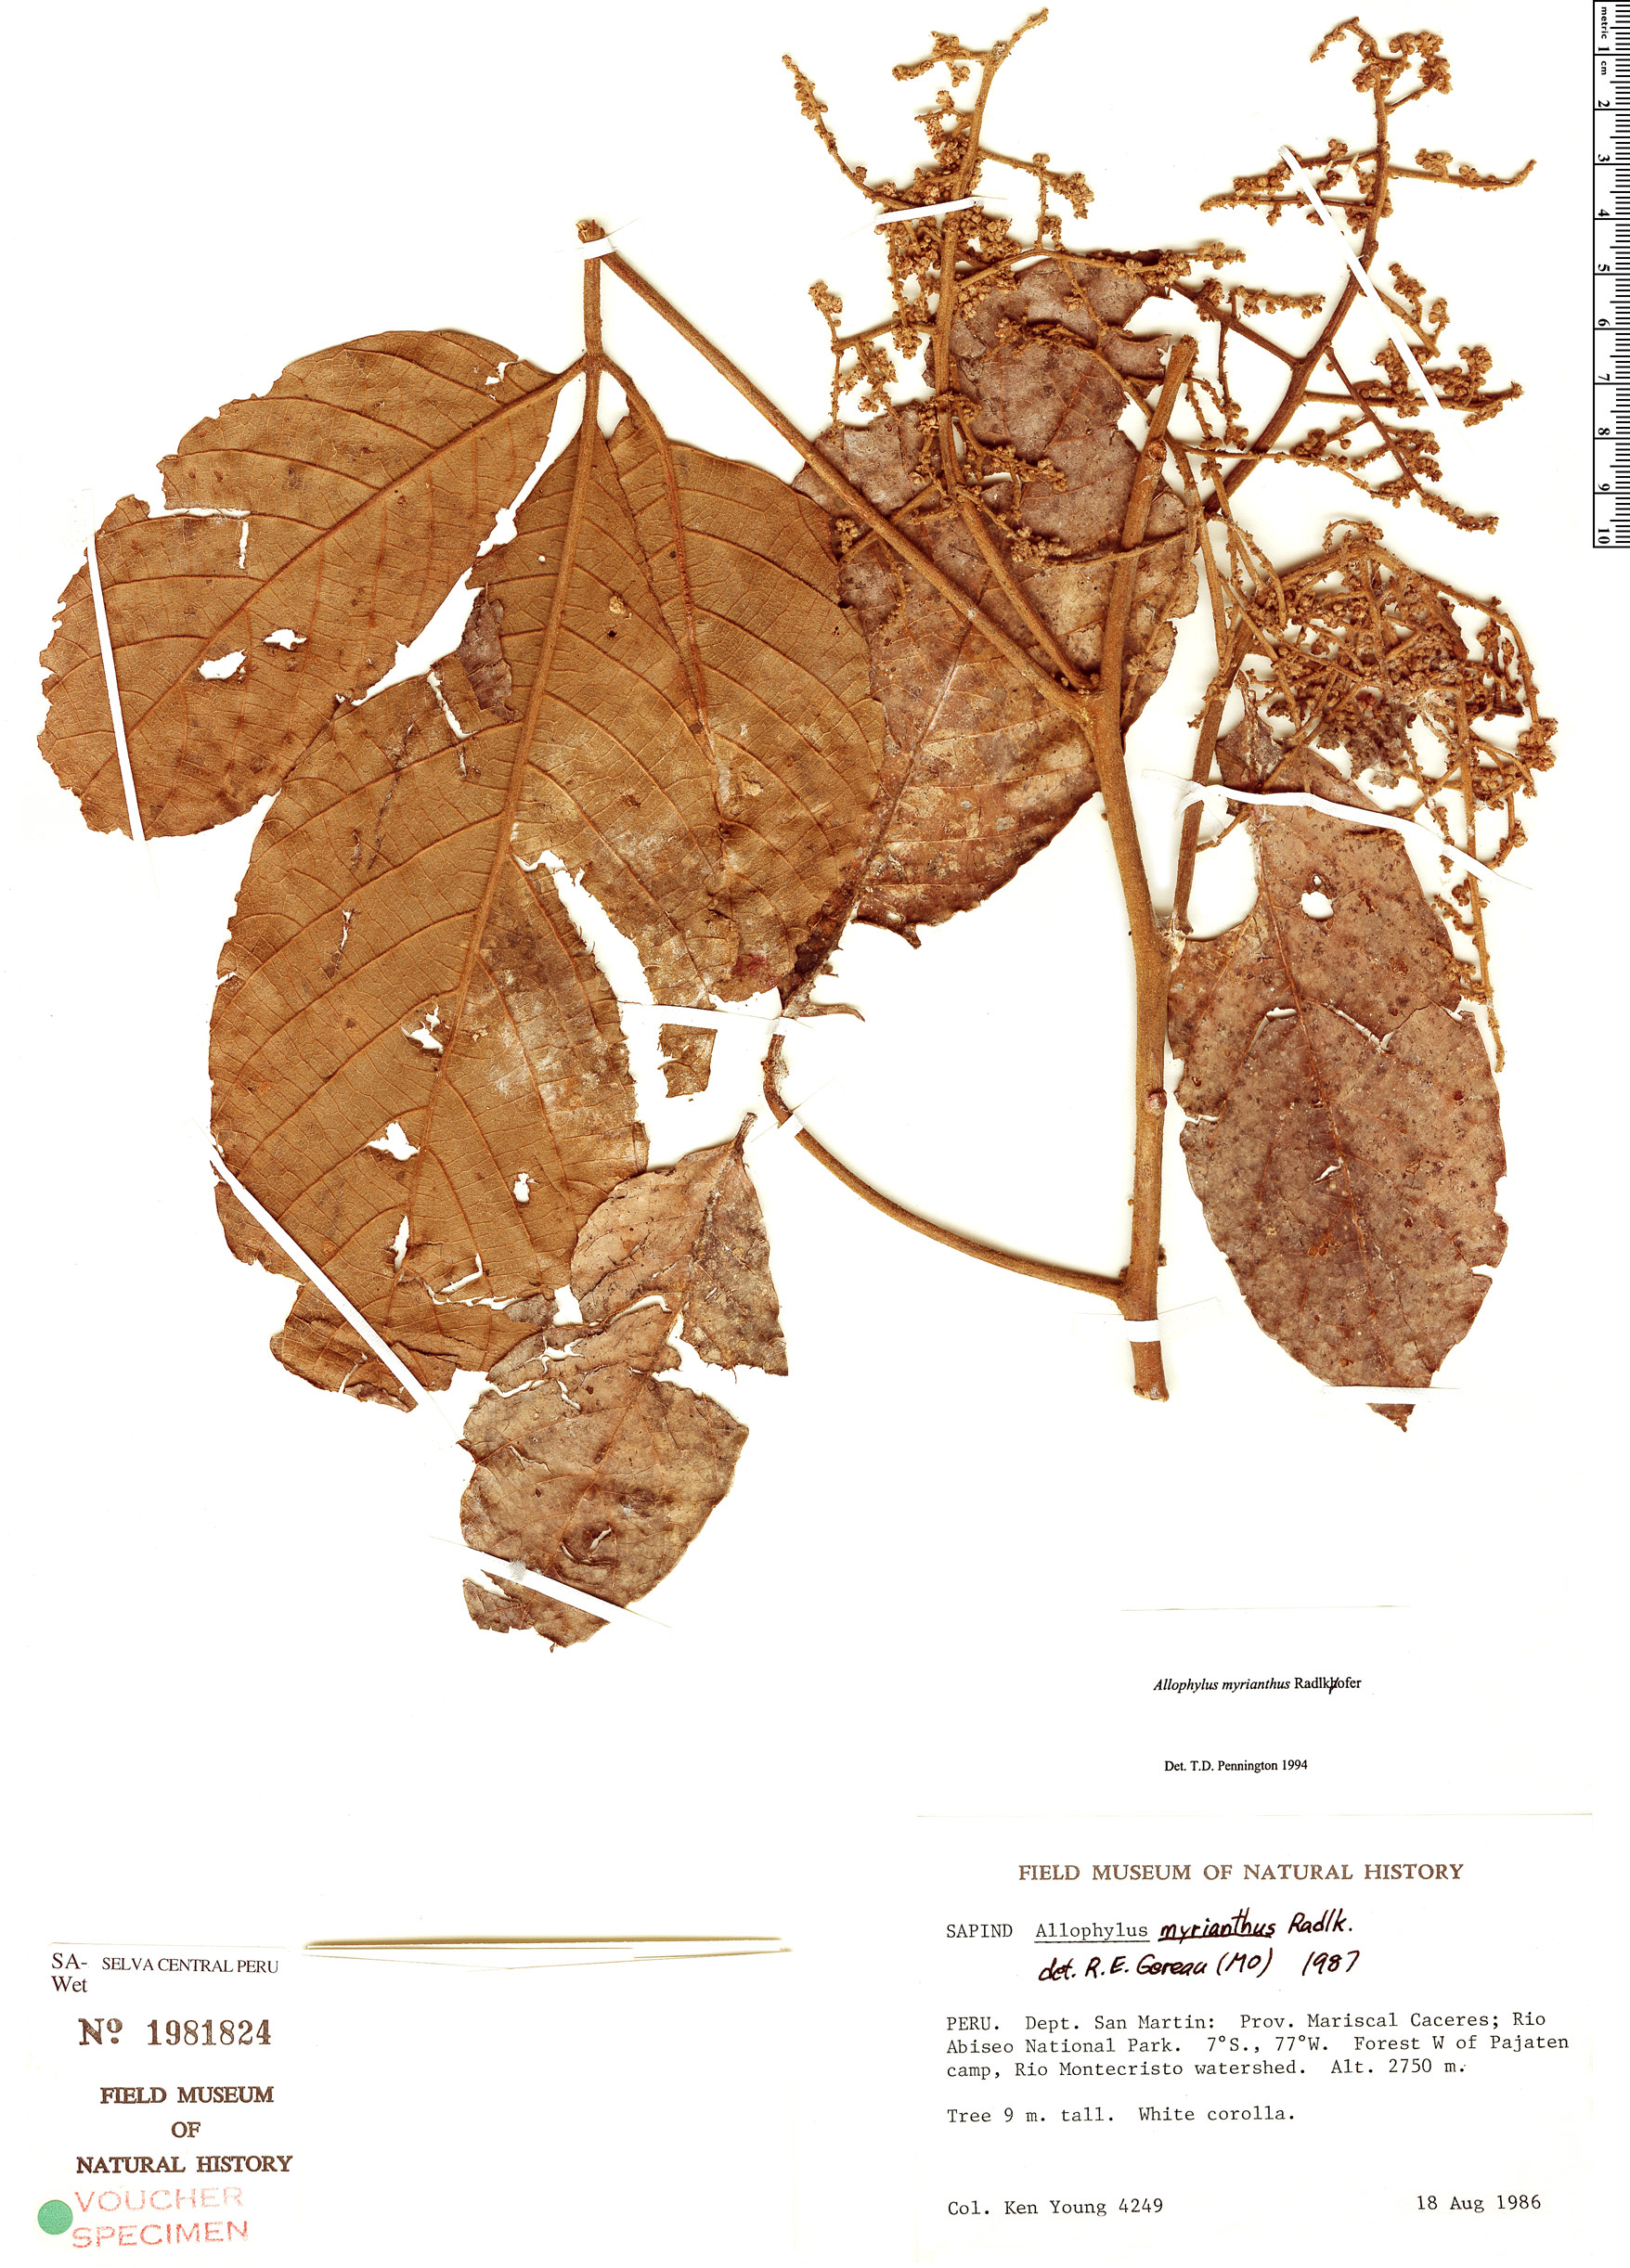 Specimen: Allophylus myrianthus